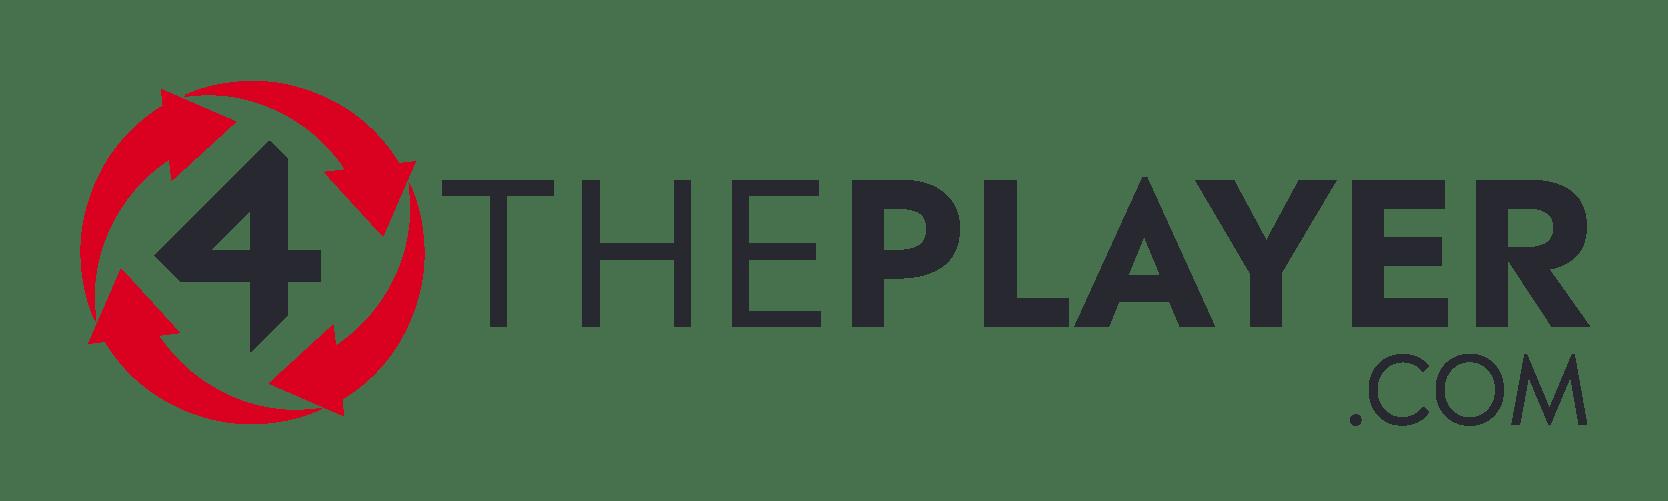 4ThePlayer jogos